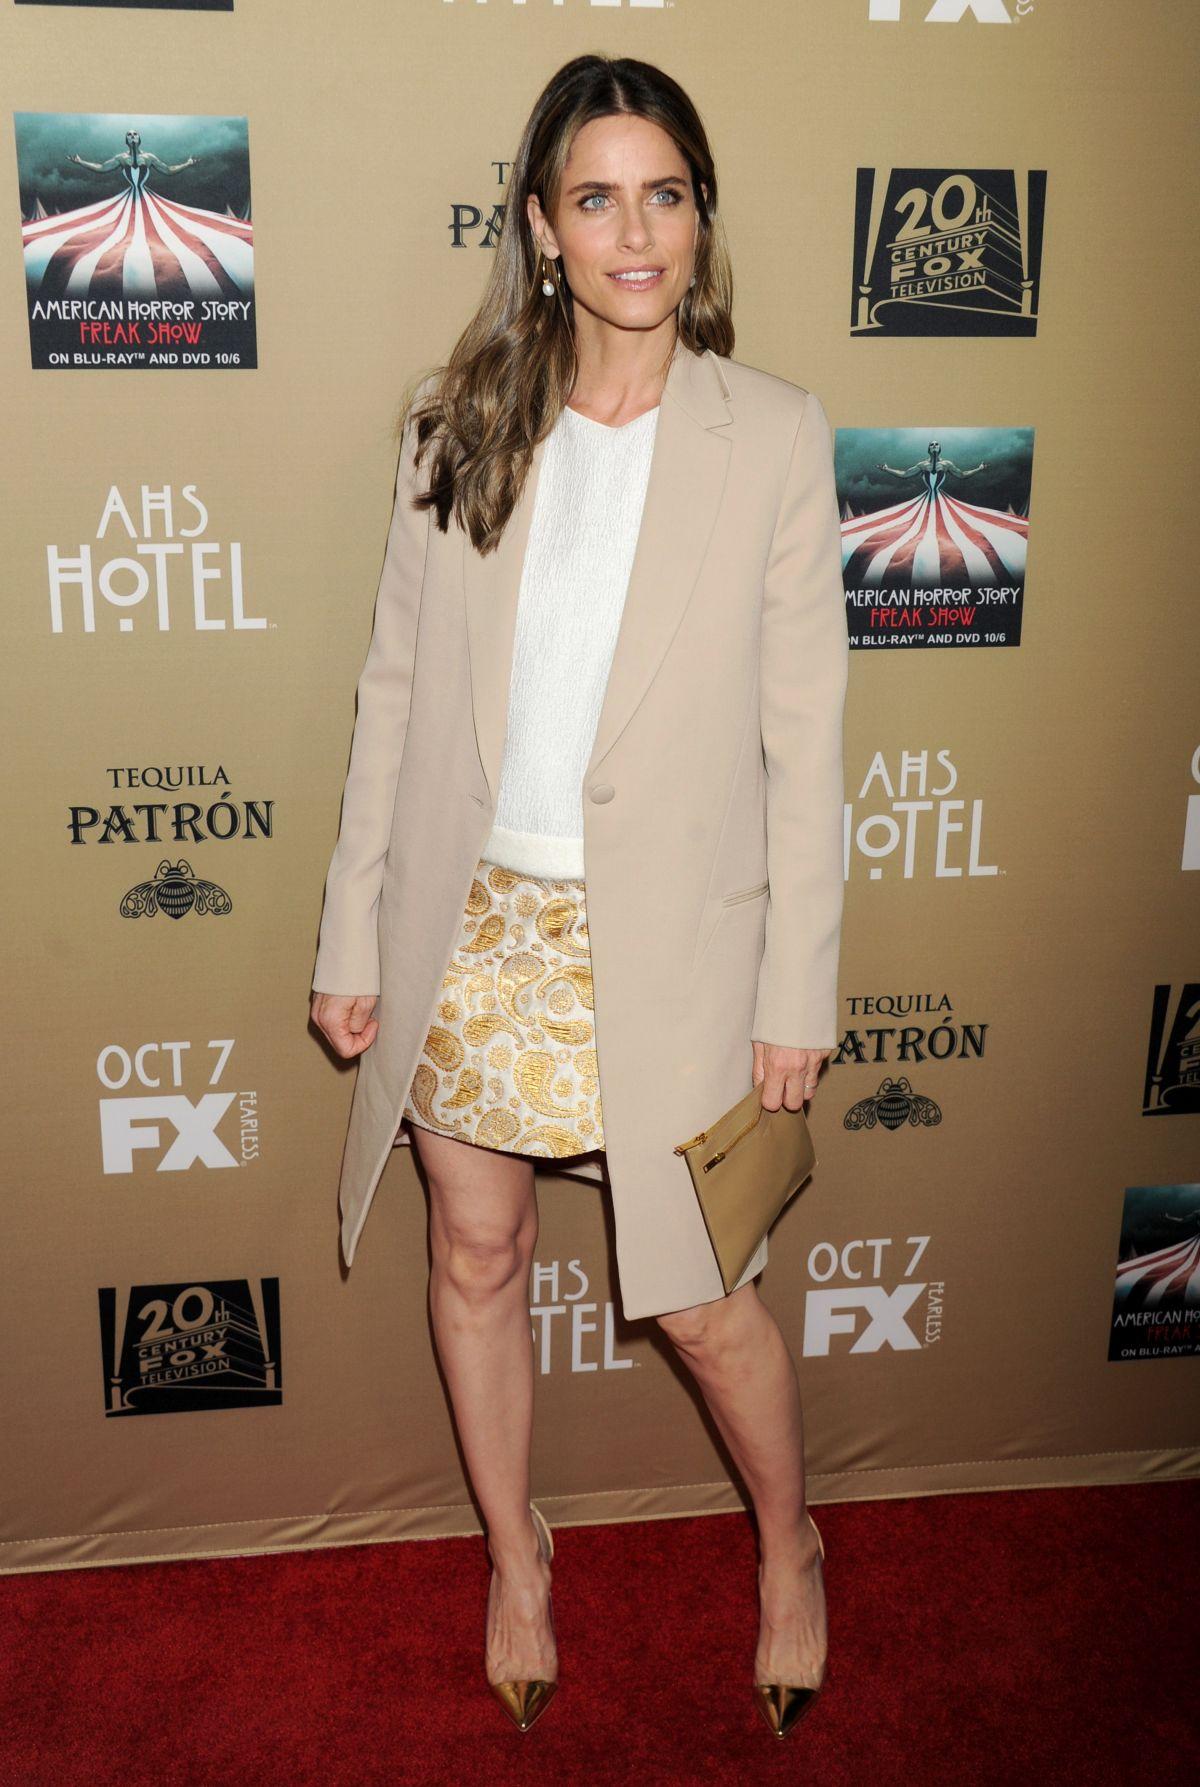 AMANDA PEET at American Horror Story: Hotel Screening in Los Angeles 10/03/2015